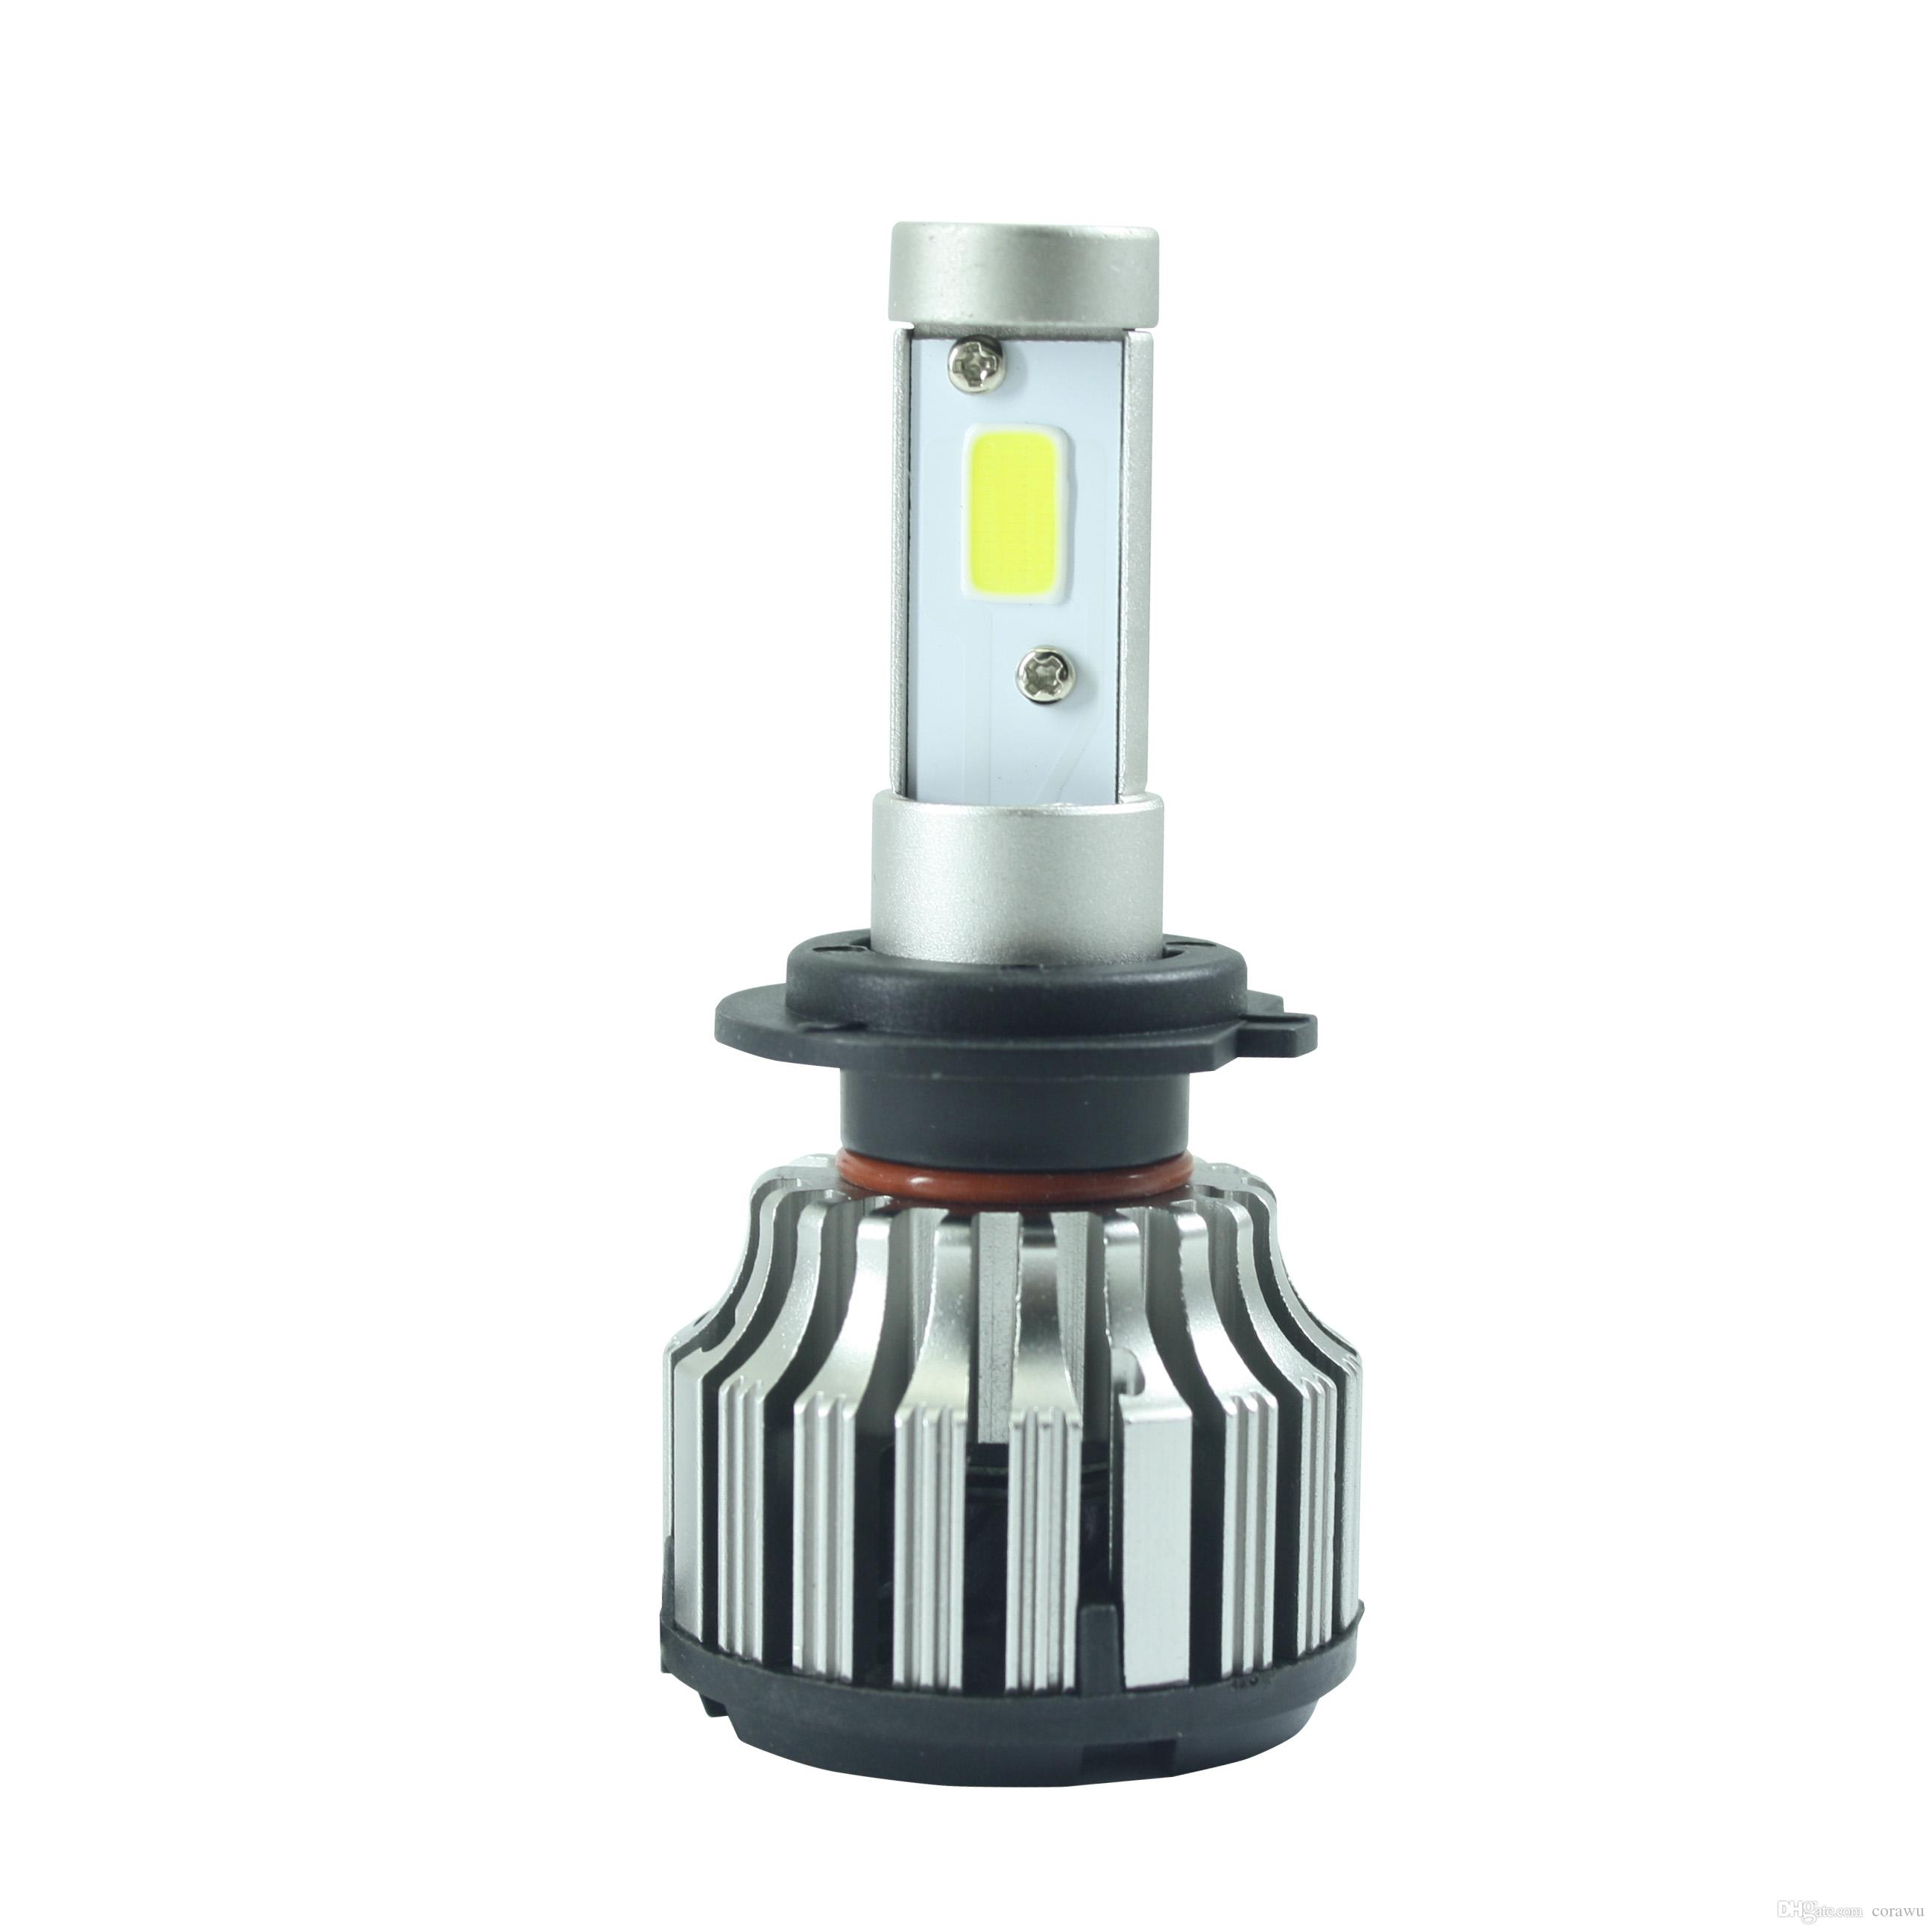 short power illuminazione hydro arc for lighting xenon professionale e en series supplies lamp lamps rectifier irem